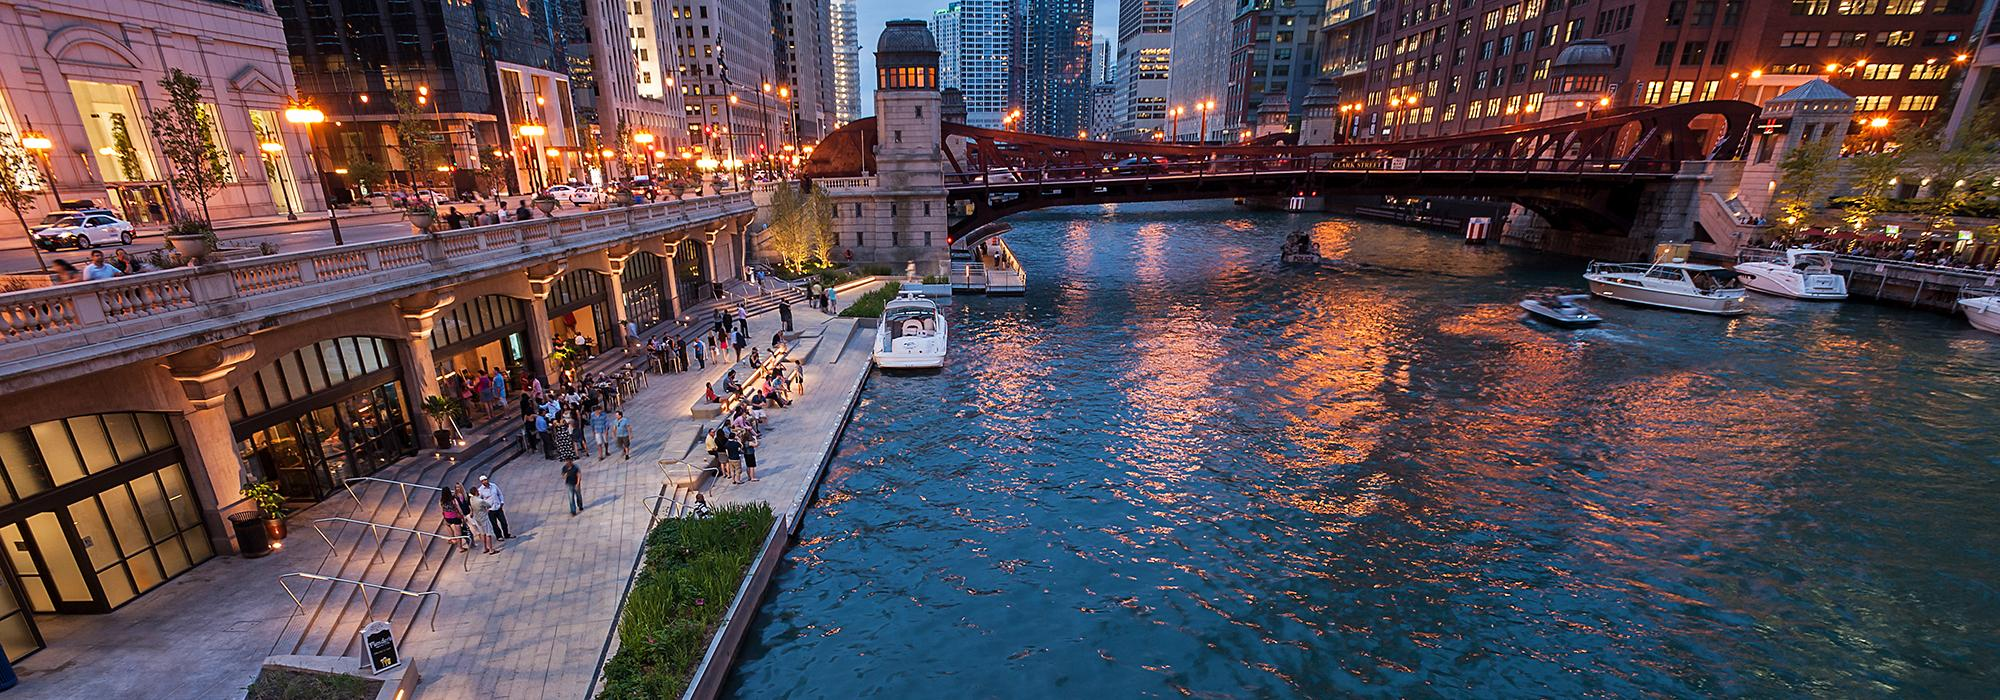 IL_Chicago_Riverwalk_SasakiAssociates.jpg